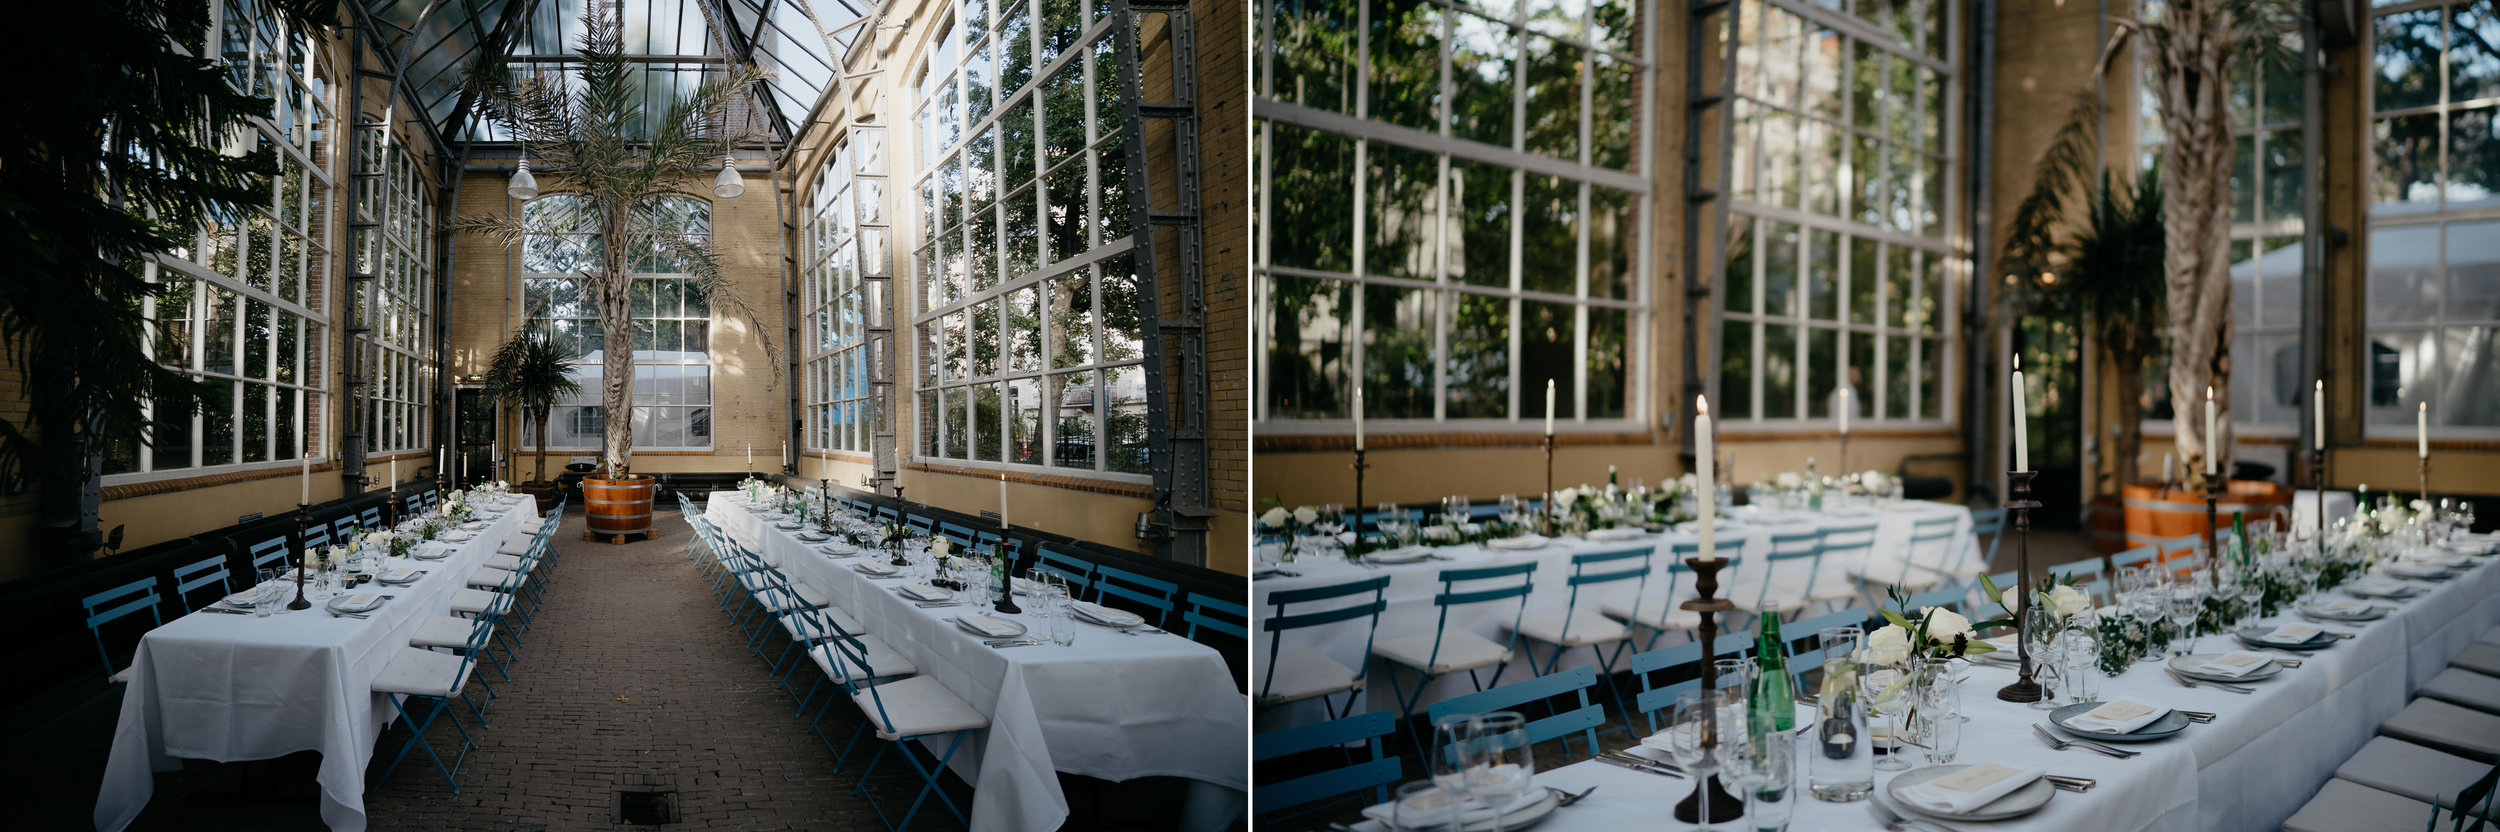 wedding dinner amsterdam hortus botanicus